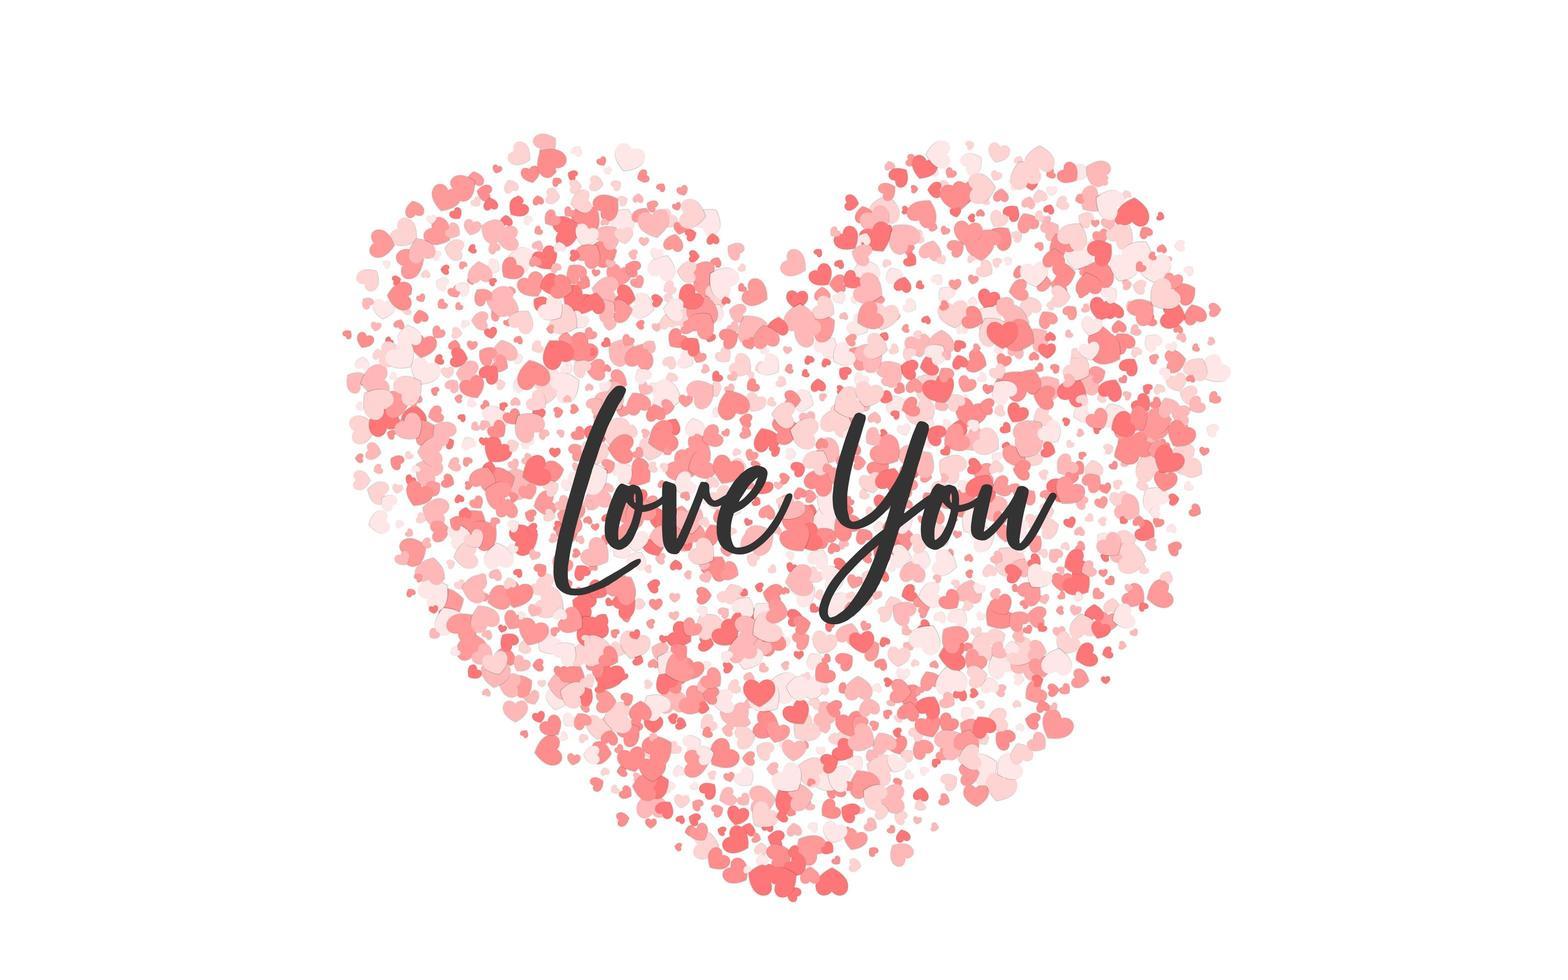 rosa Papier Valentinstag Konfettis vektor